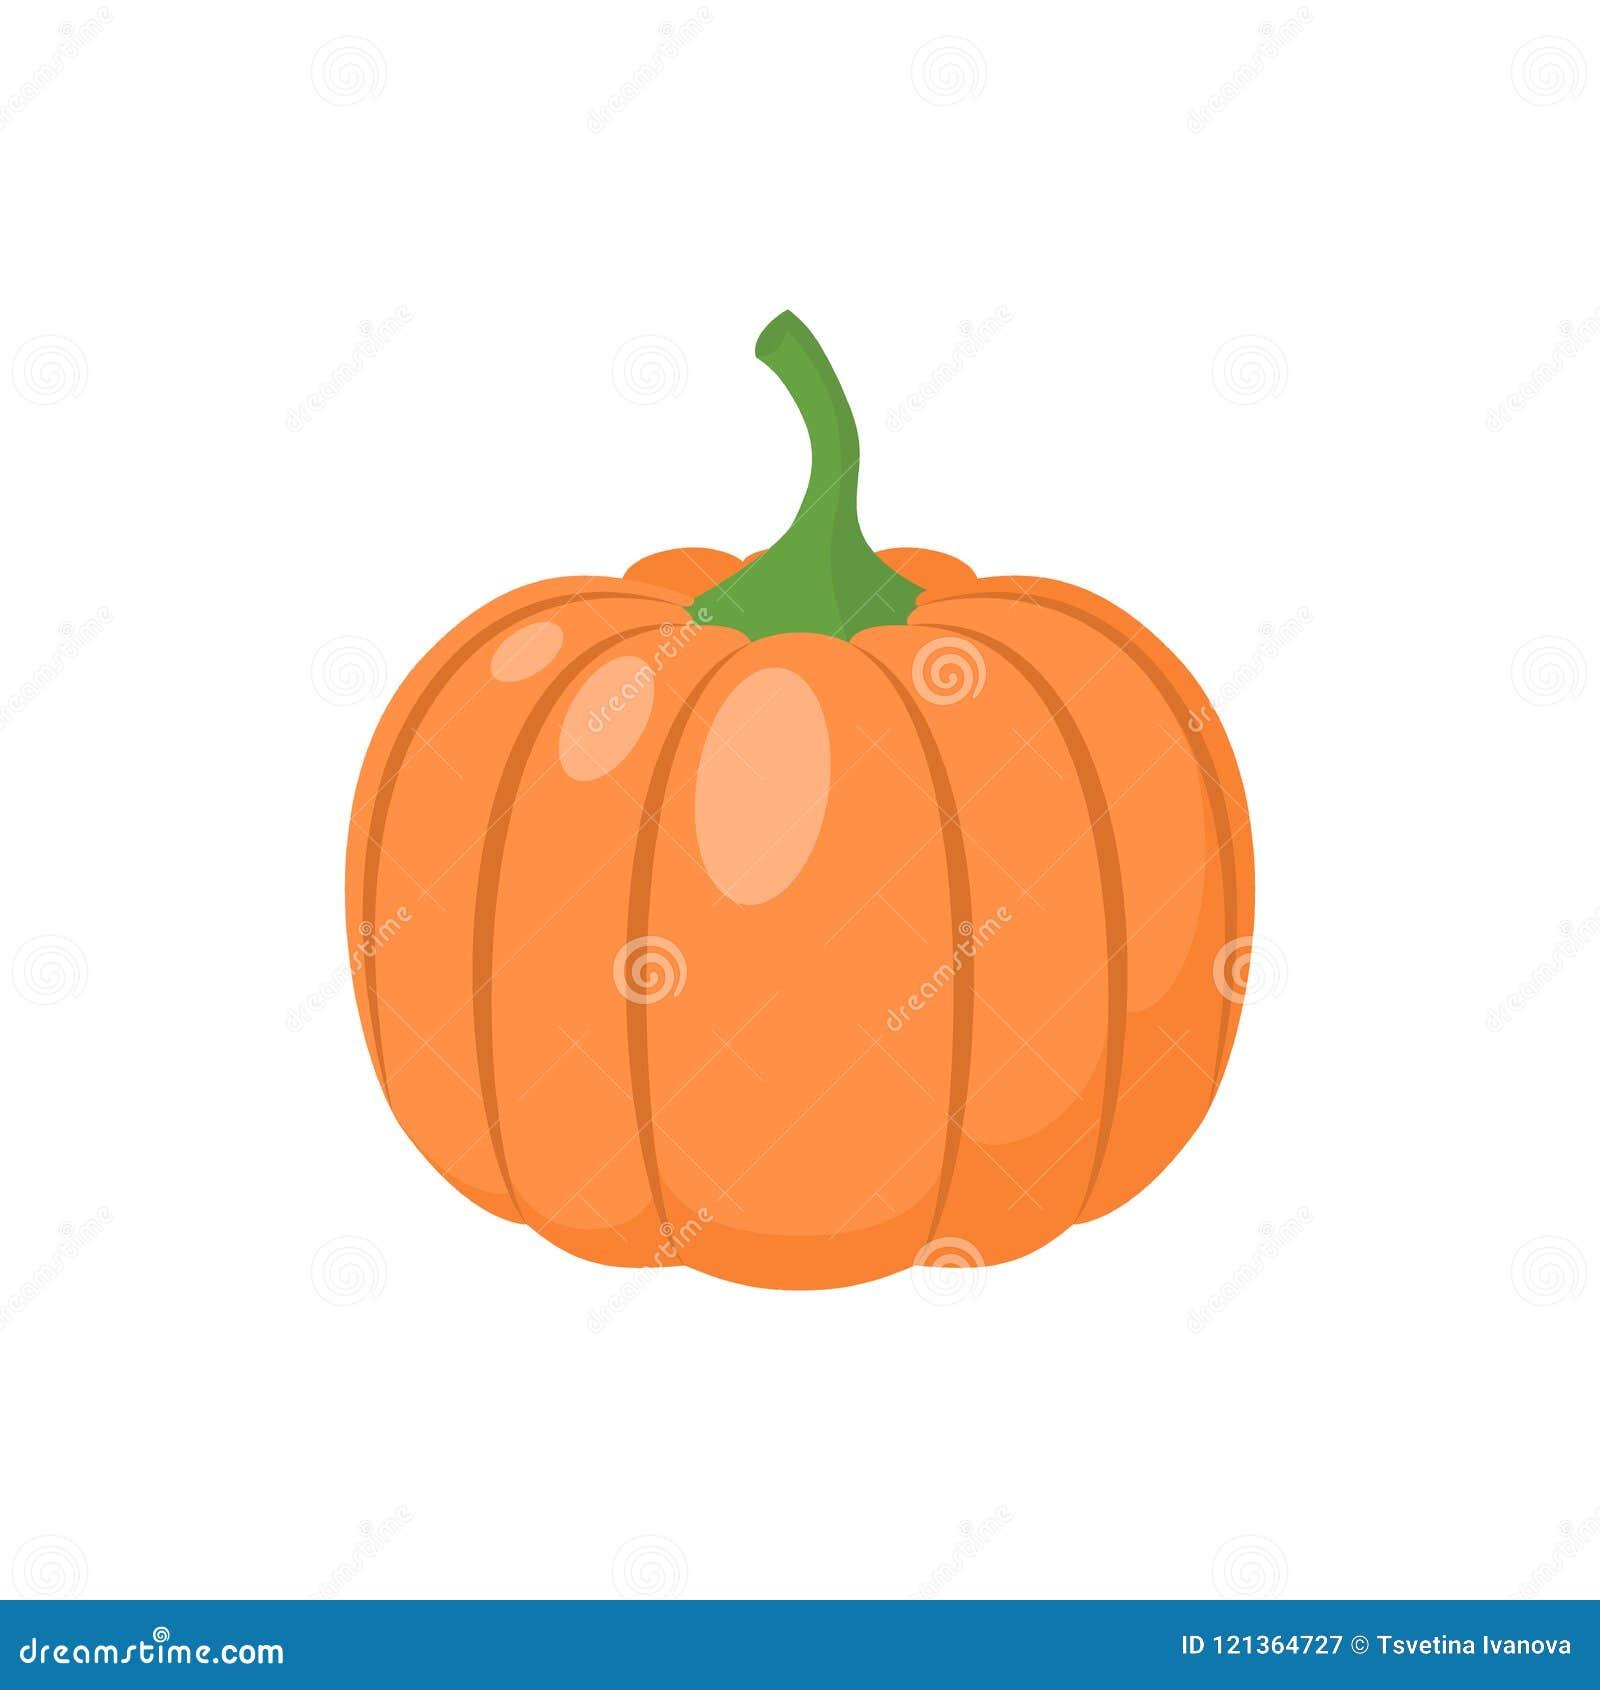 Значок vegetable clipart тыквы простой Шарж тыквы